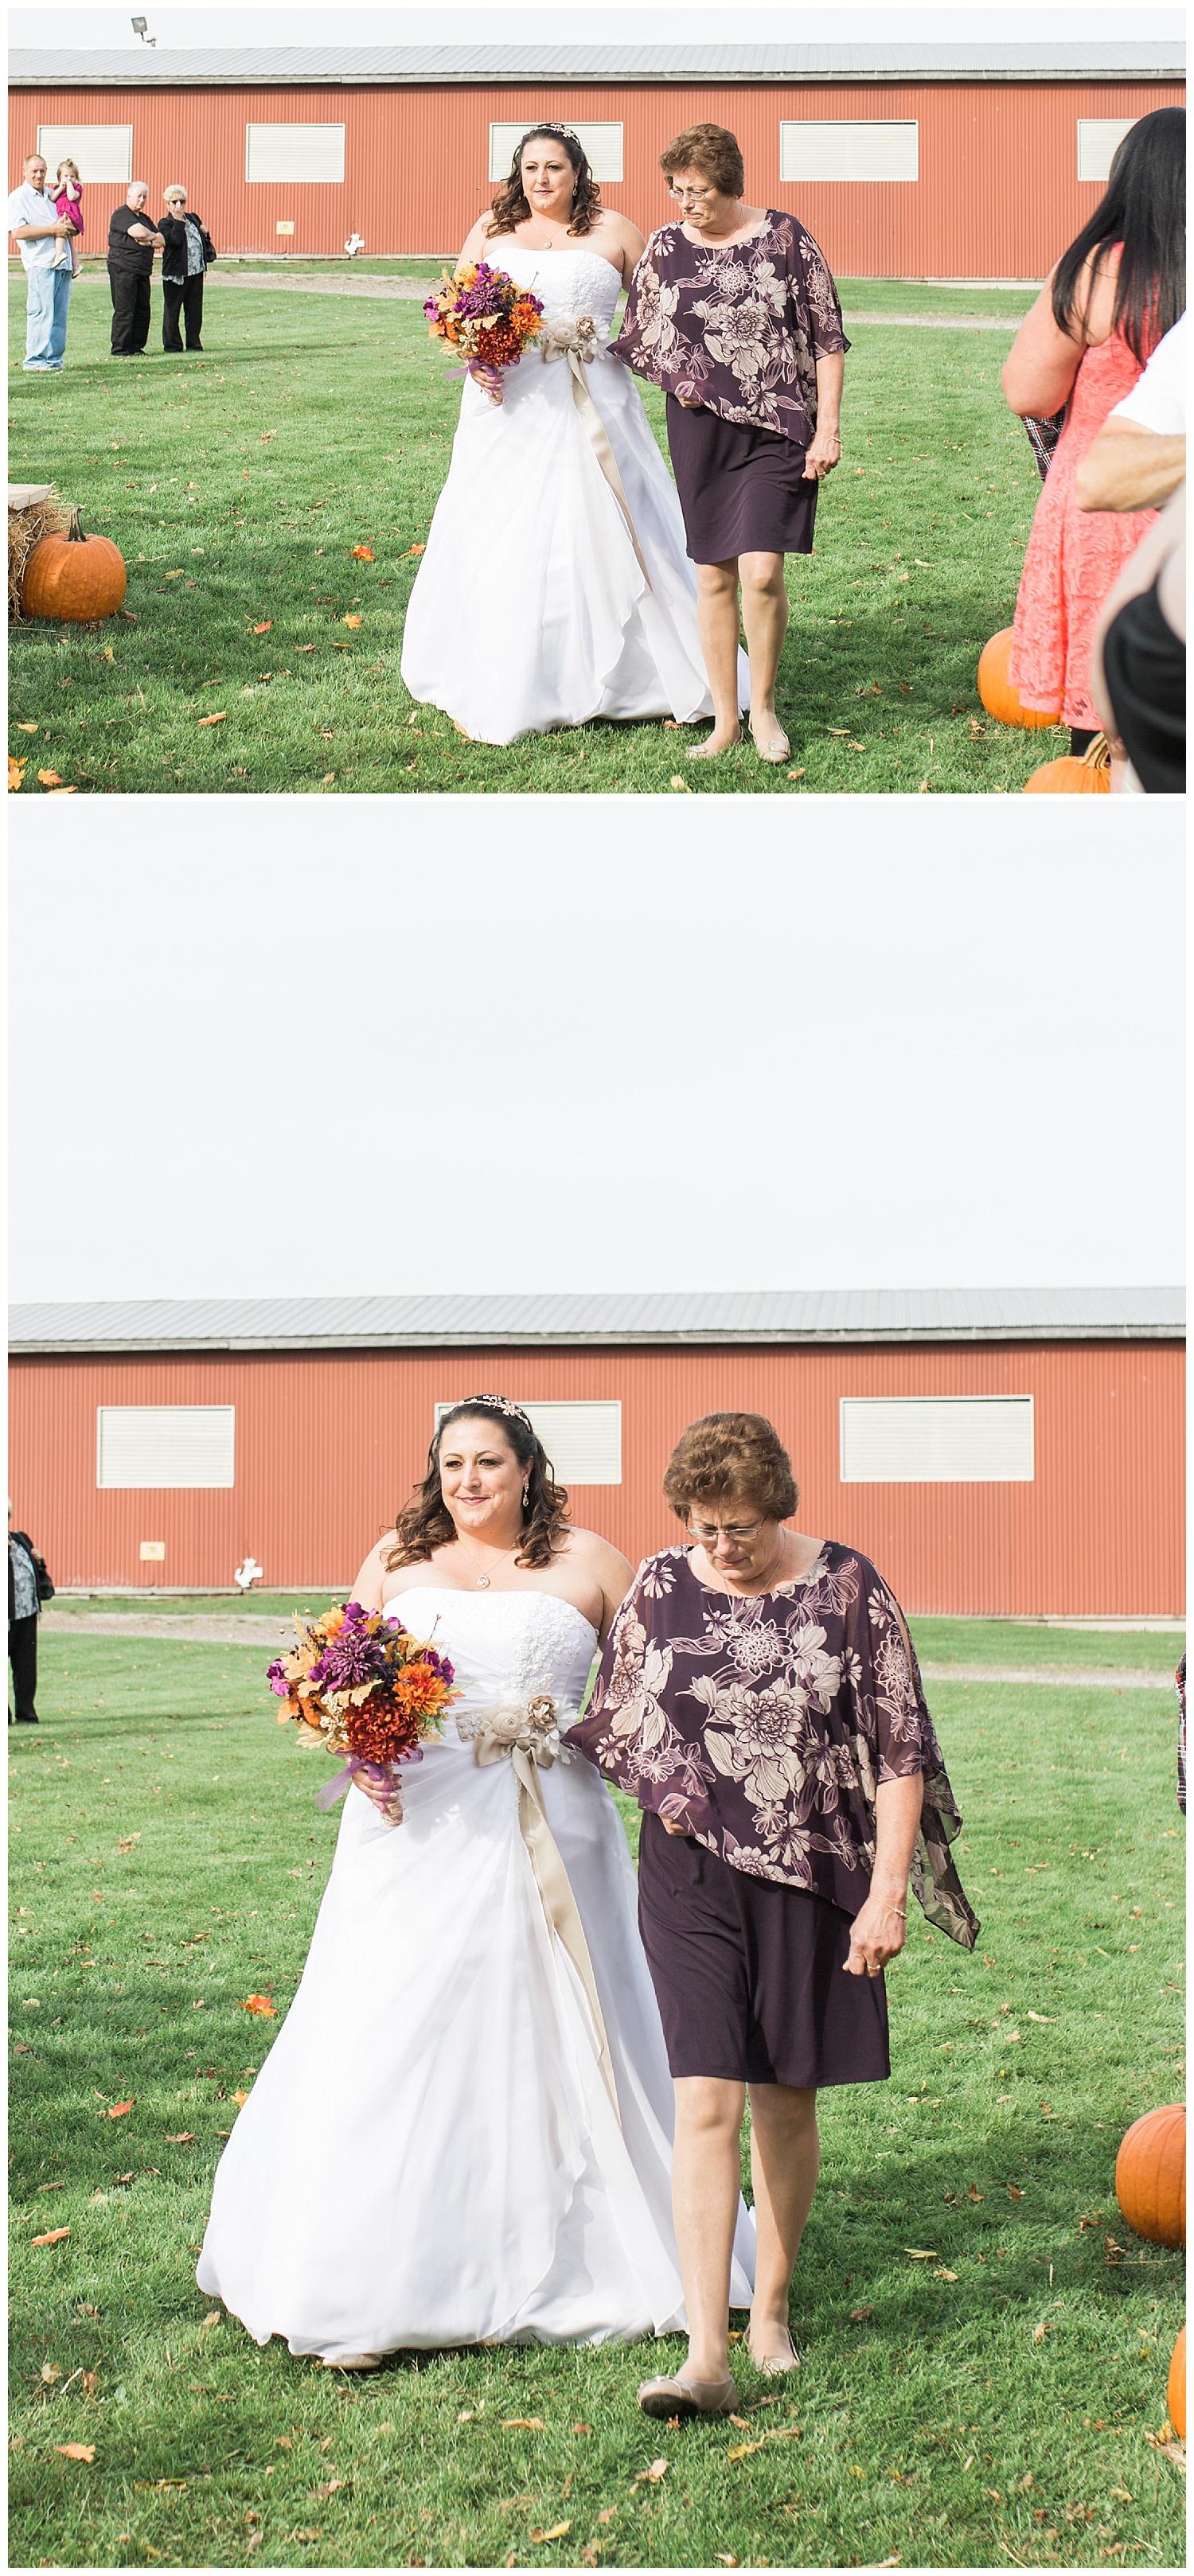 The Hall Wedding - York NY - Lass and Beau-337_Buffalo wedding photography.jpg